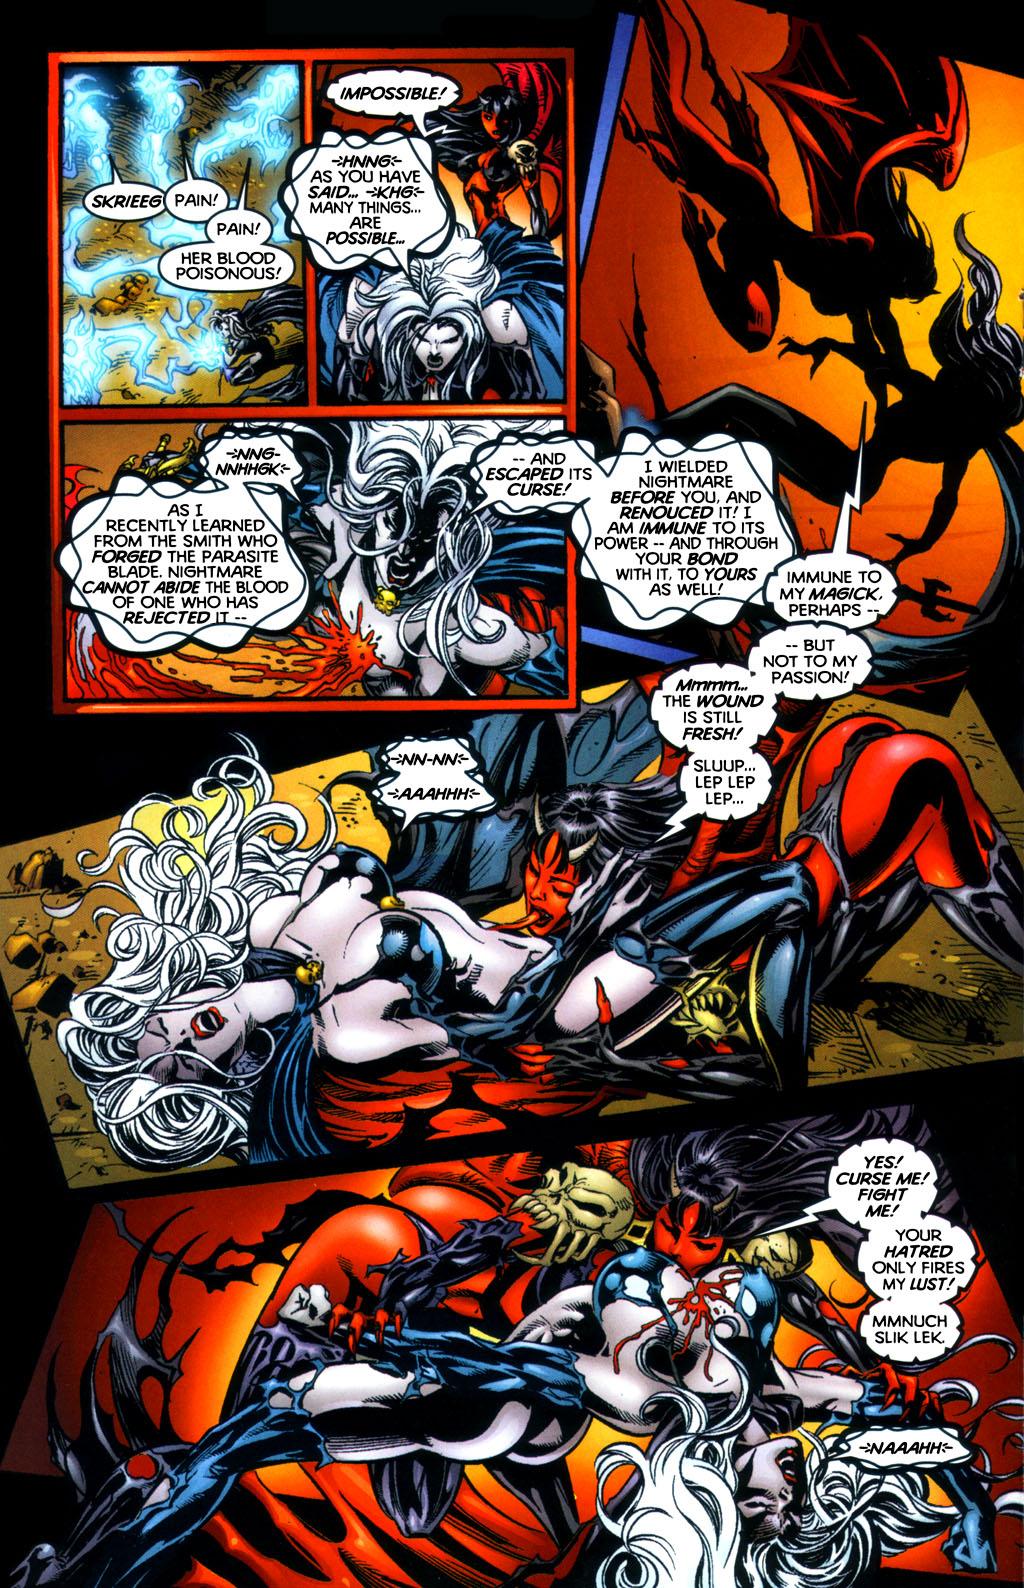 Read online Lady Death vs. Purgatori comic -  Issue # Full - 18